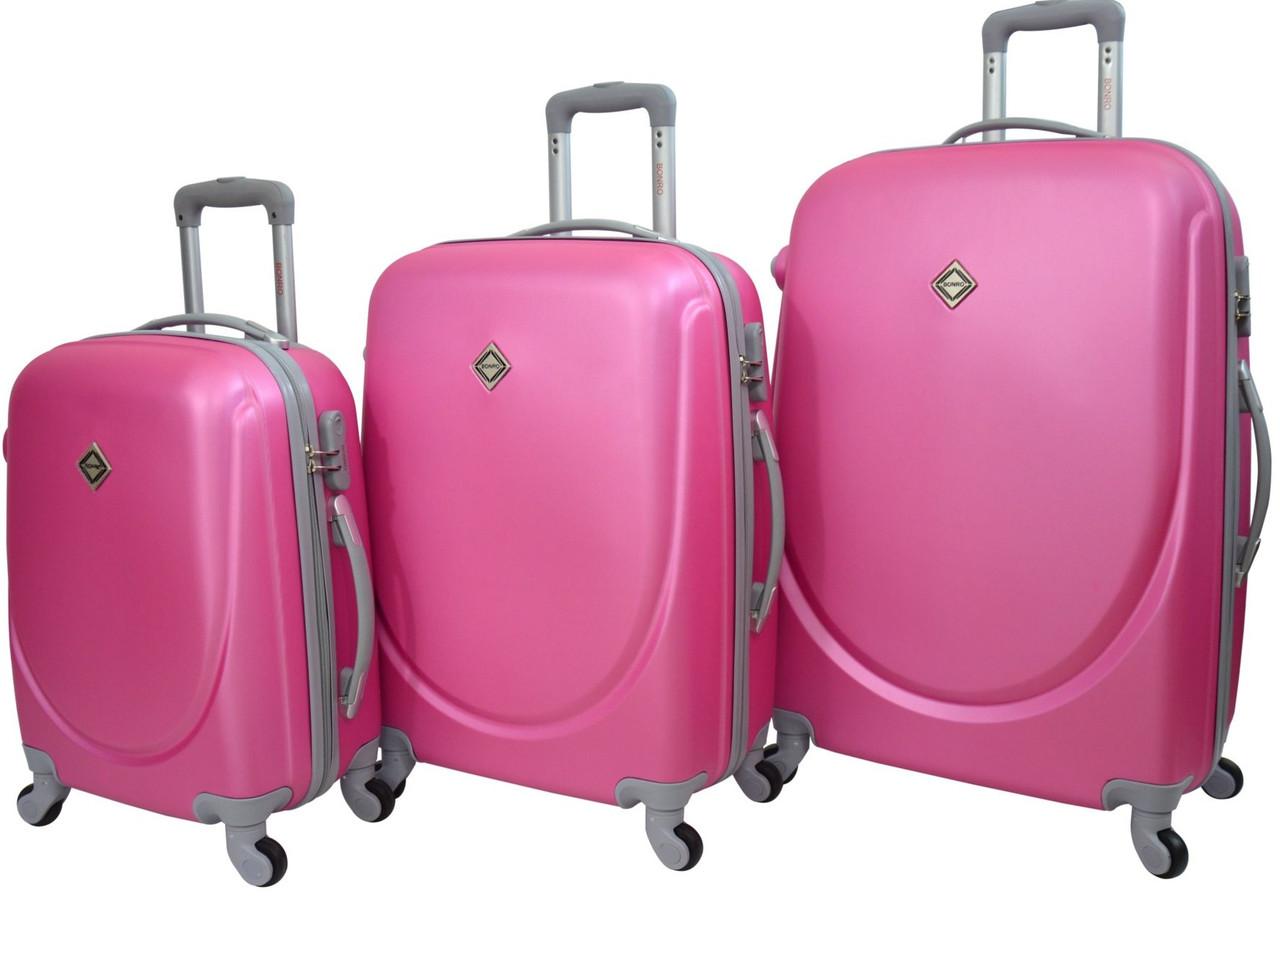 Чемодан Bonro Smile набор 3 штуки, розовый